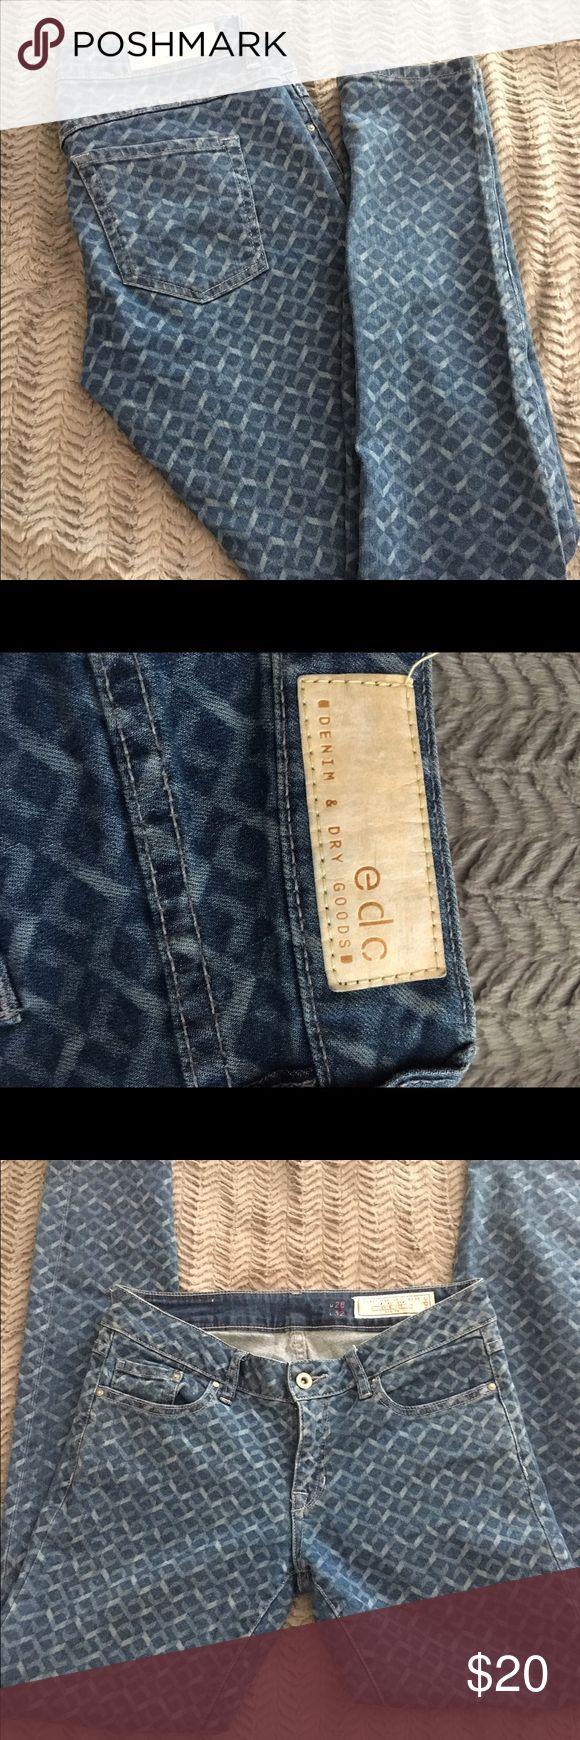 "edc denim & dry goods printed skinny jeans Like new. 99% cotton, 1% elastane. Approx. measurements: 15"" waist, 8"" rise, 32"" inseam. edc denim and dry goods Jeans Skinny"